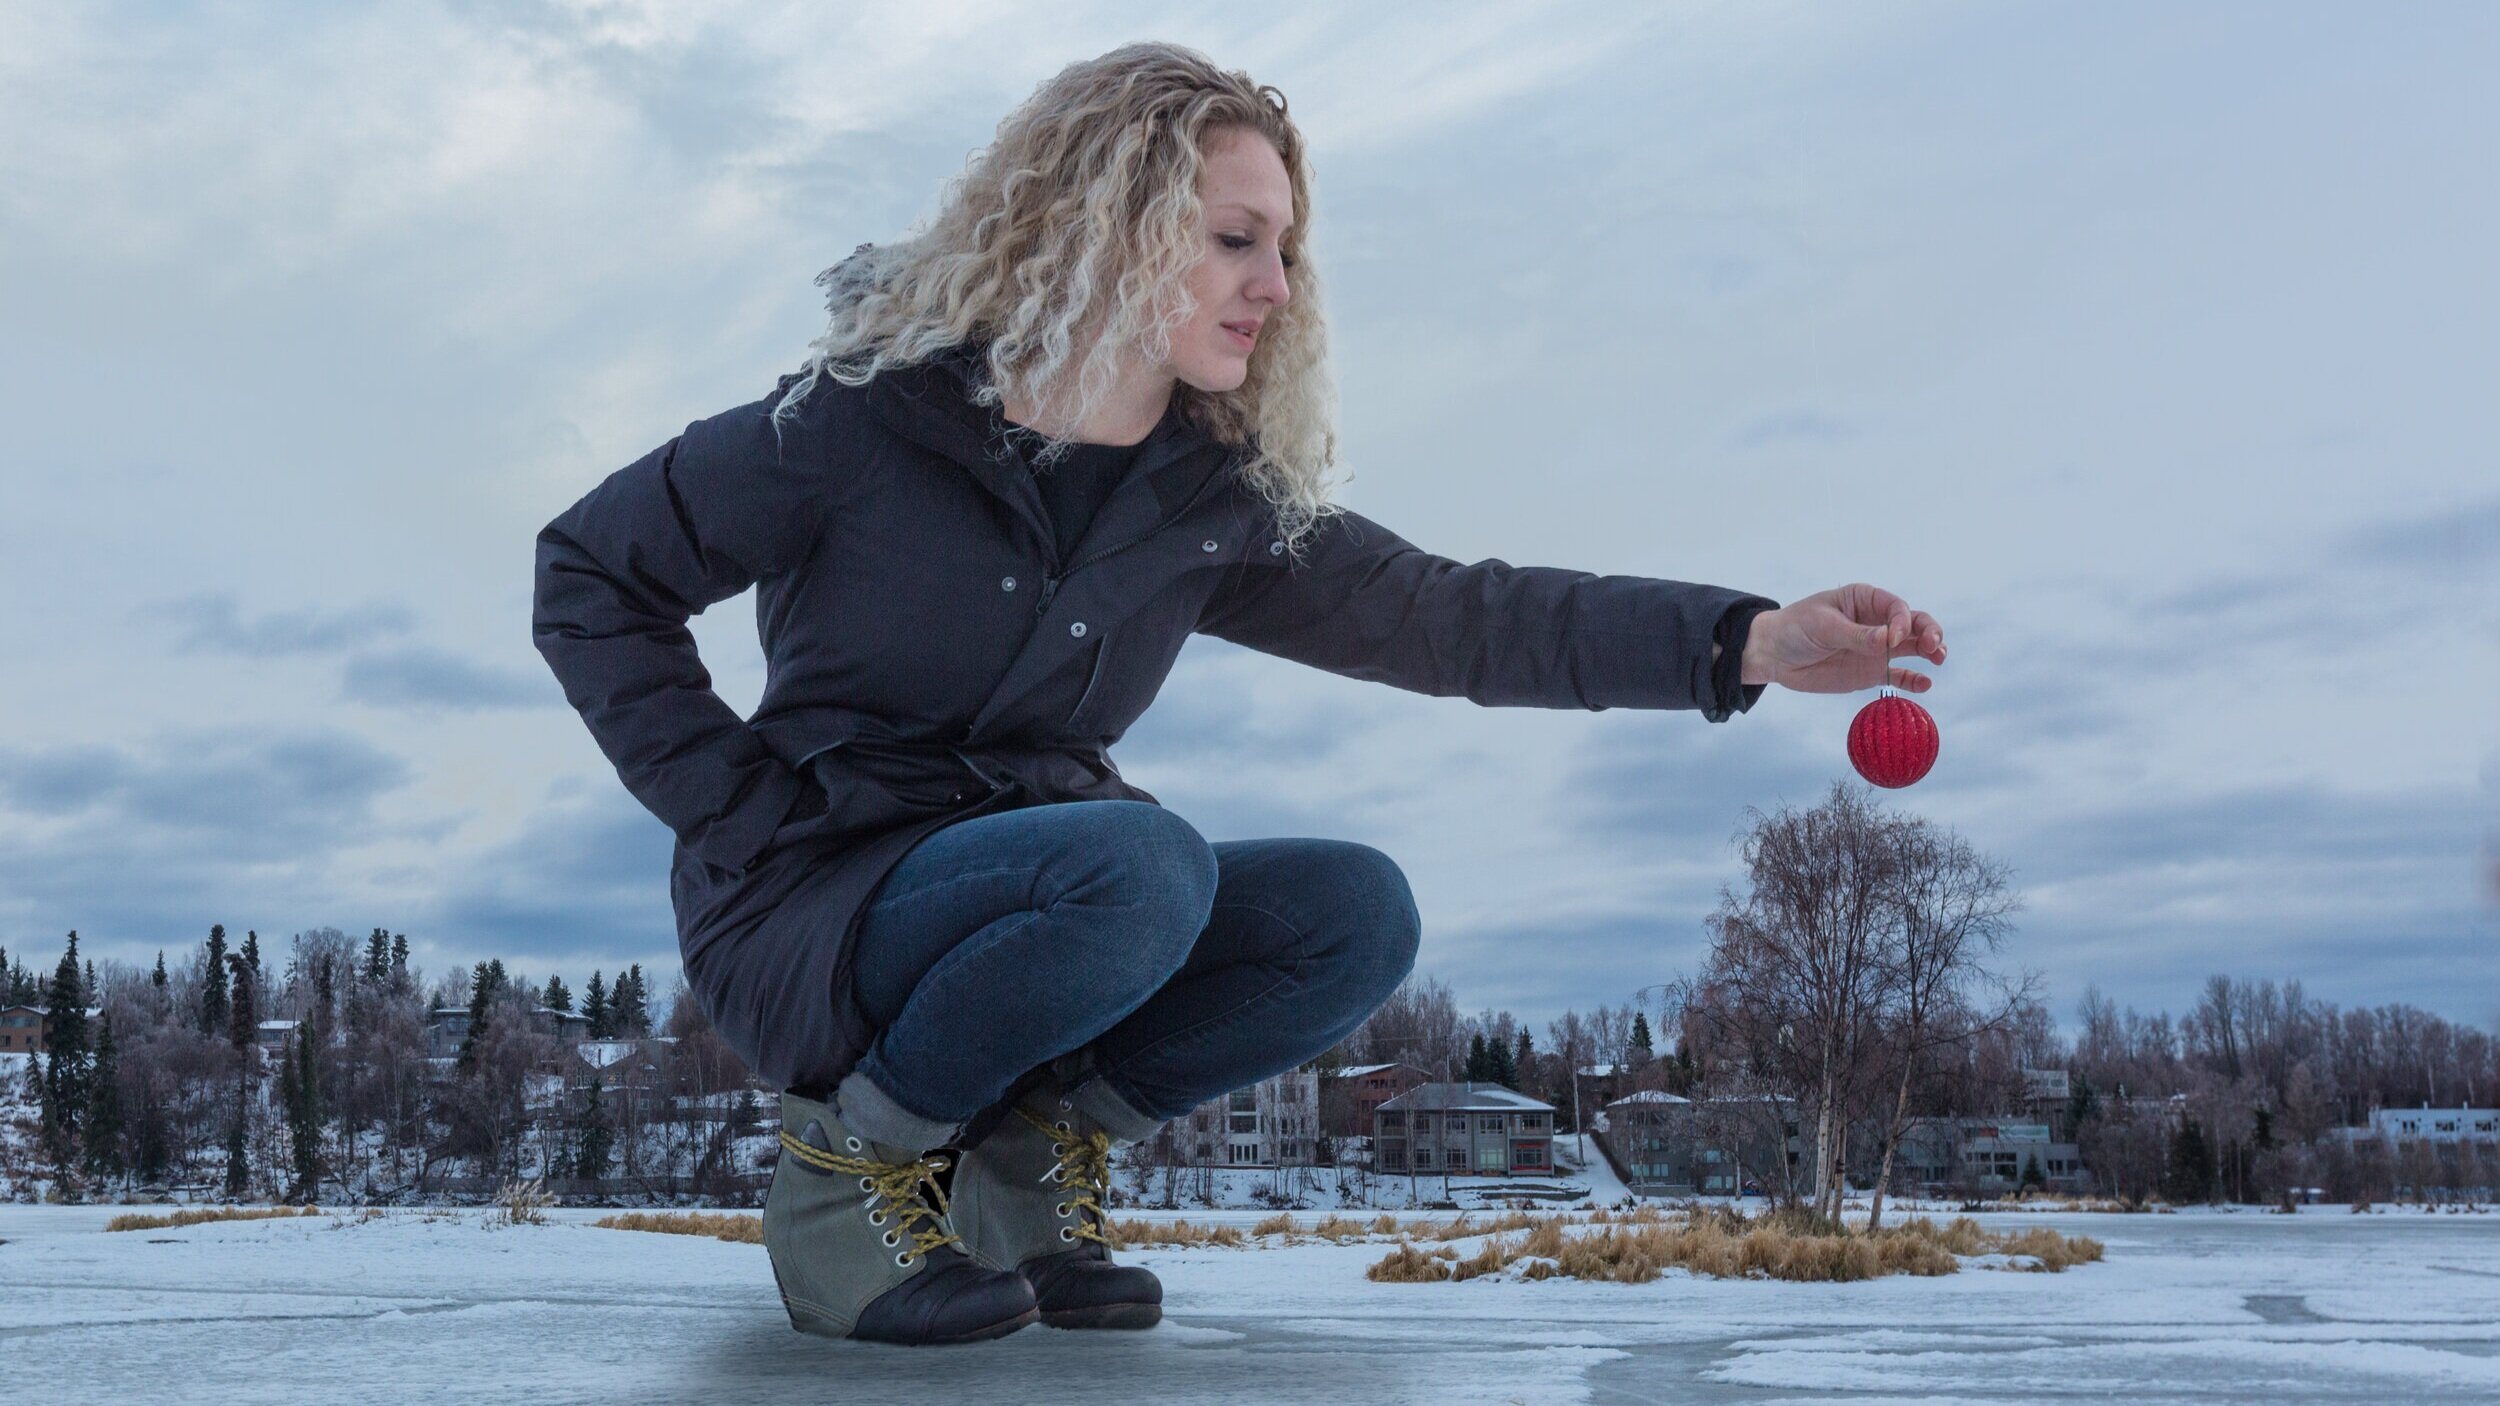 alaska-photoventures-ornaments.jpg